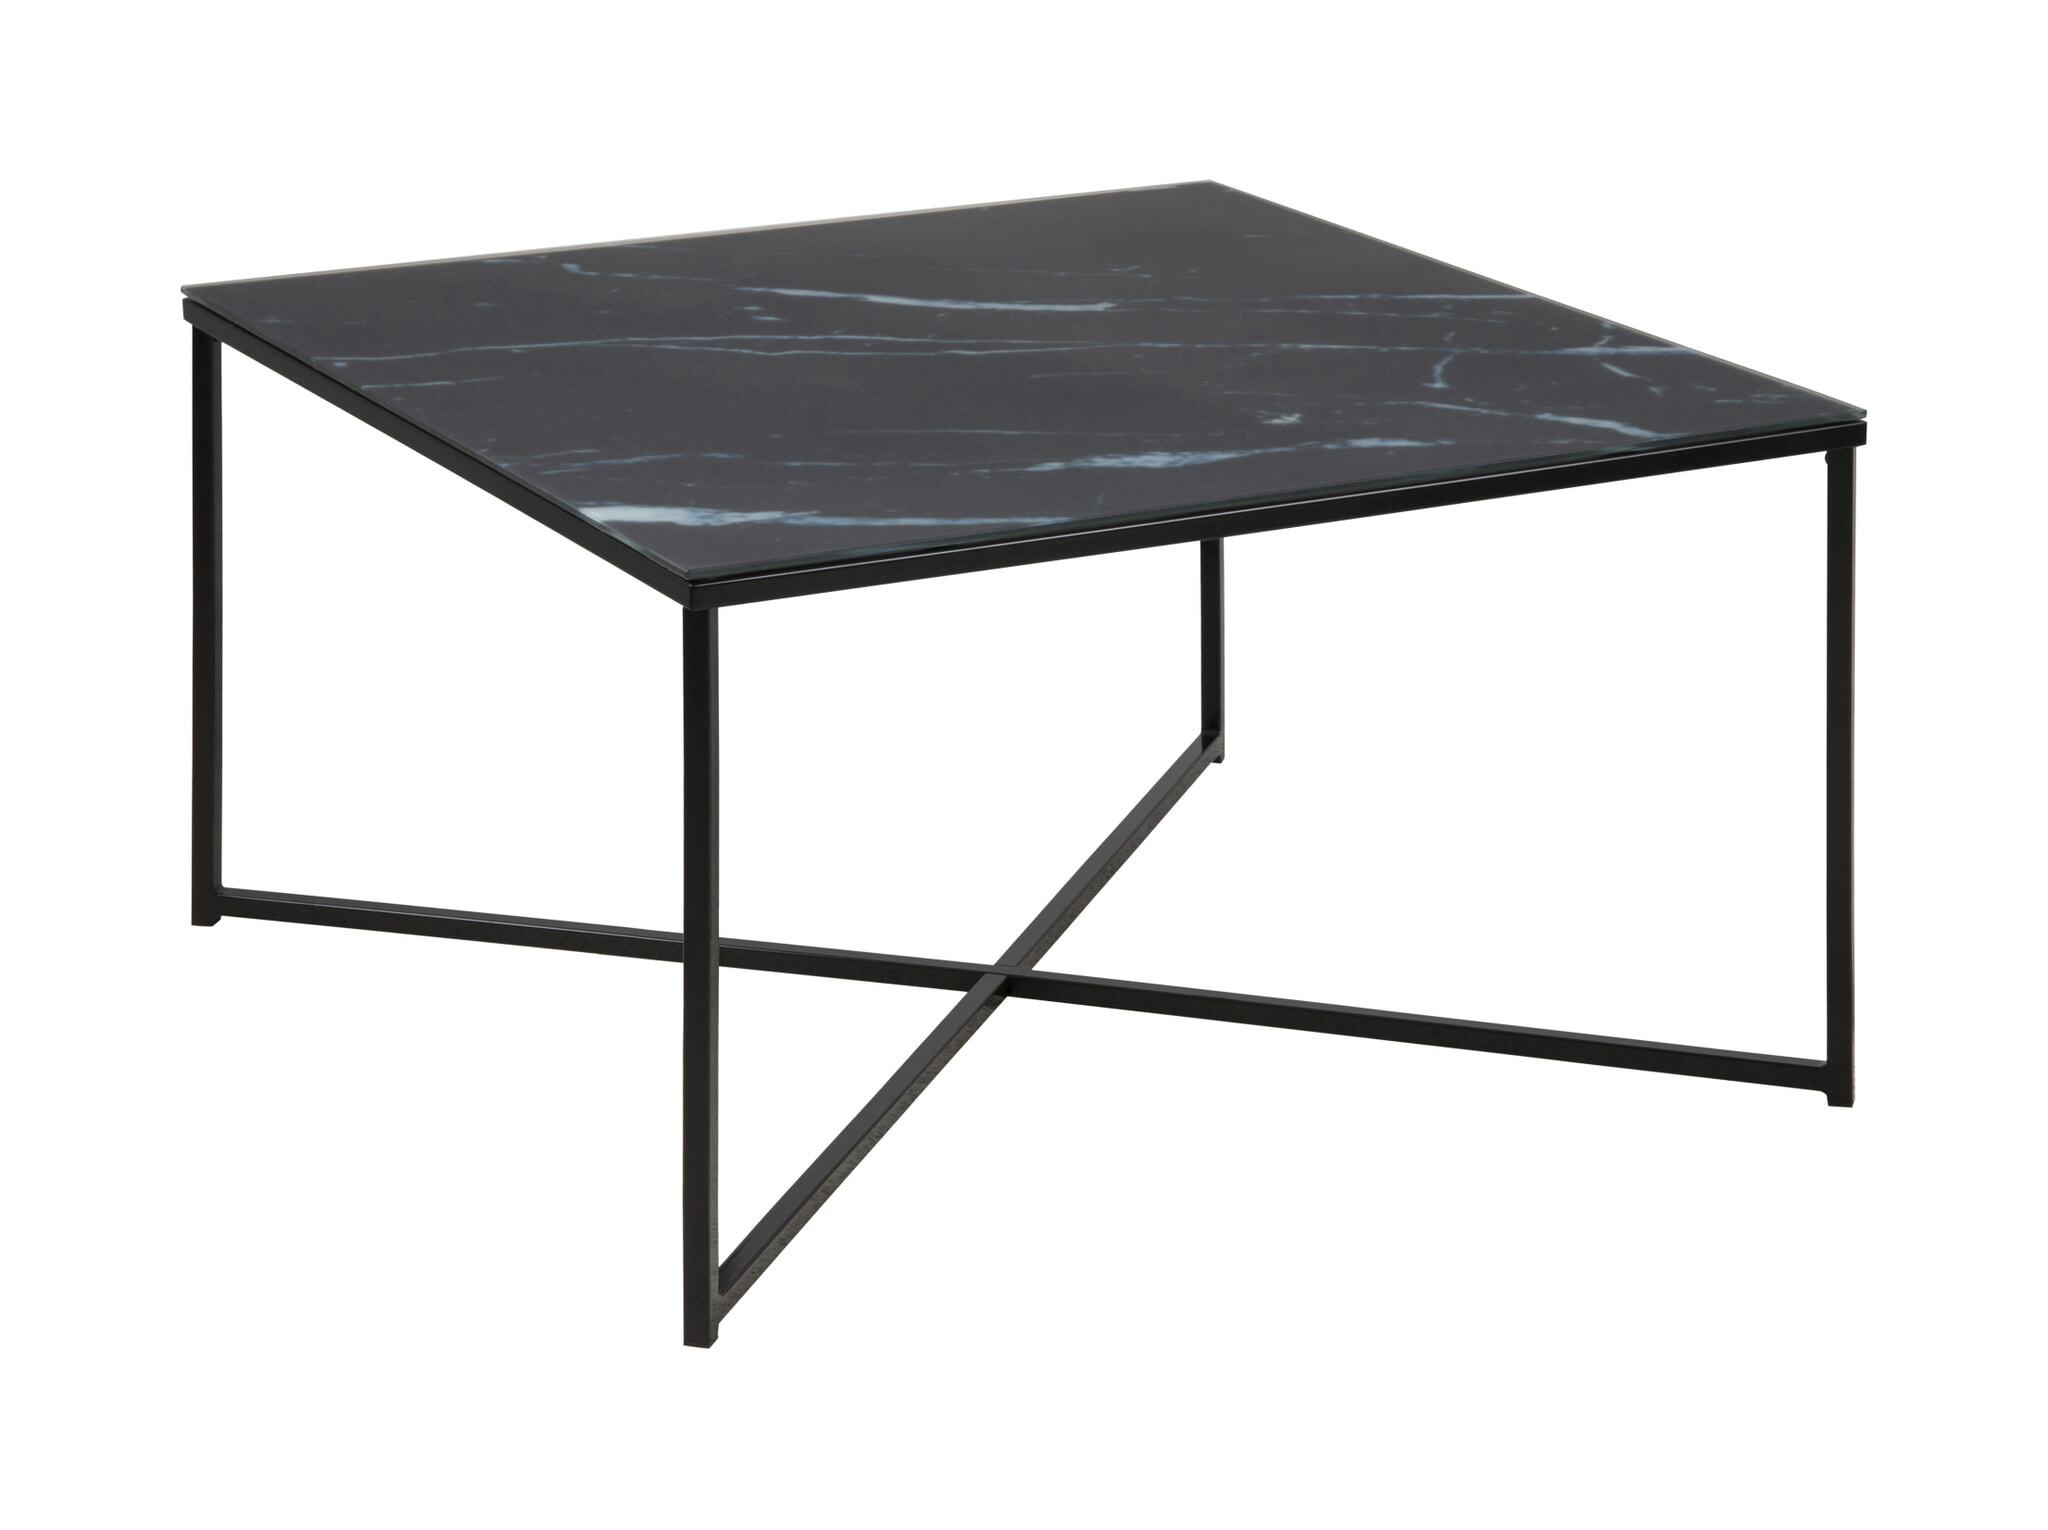 Zwarte Vierkante Salontafel.Bendt Vierkante Salontafel Cay 80cm Zwart Marmer